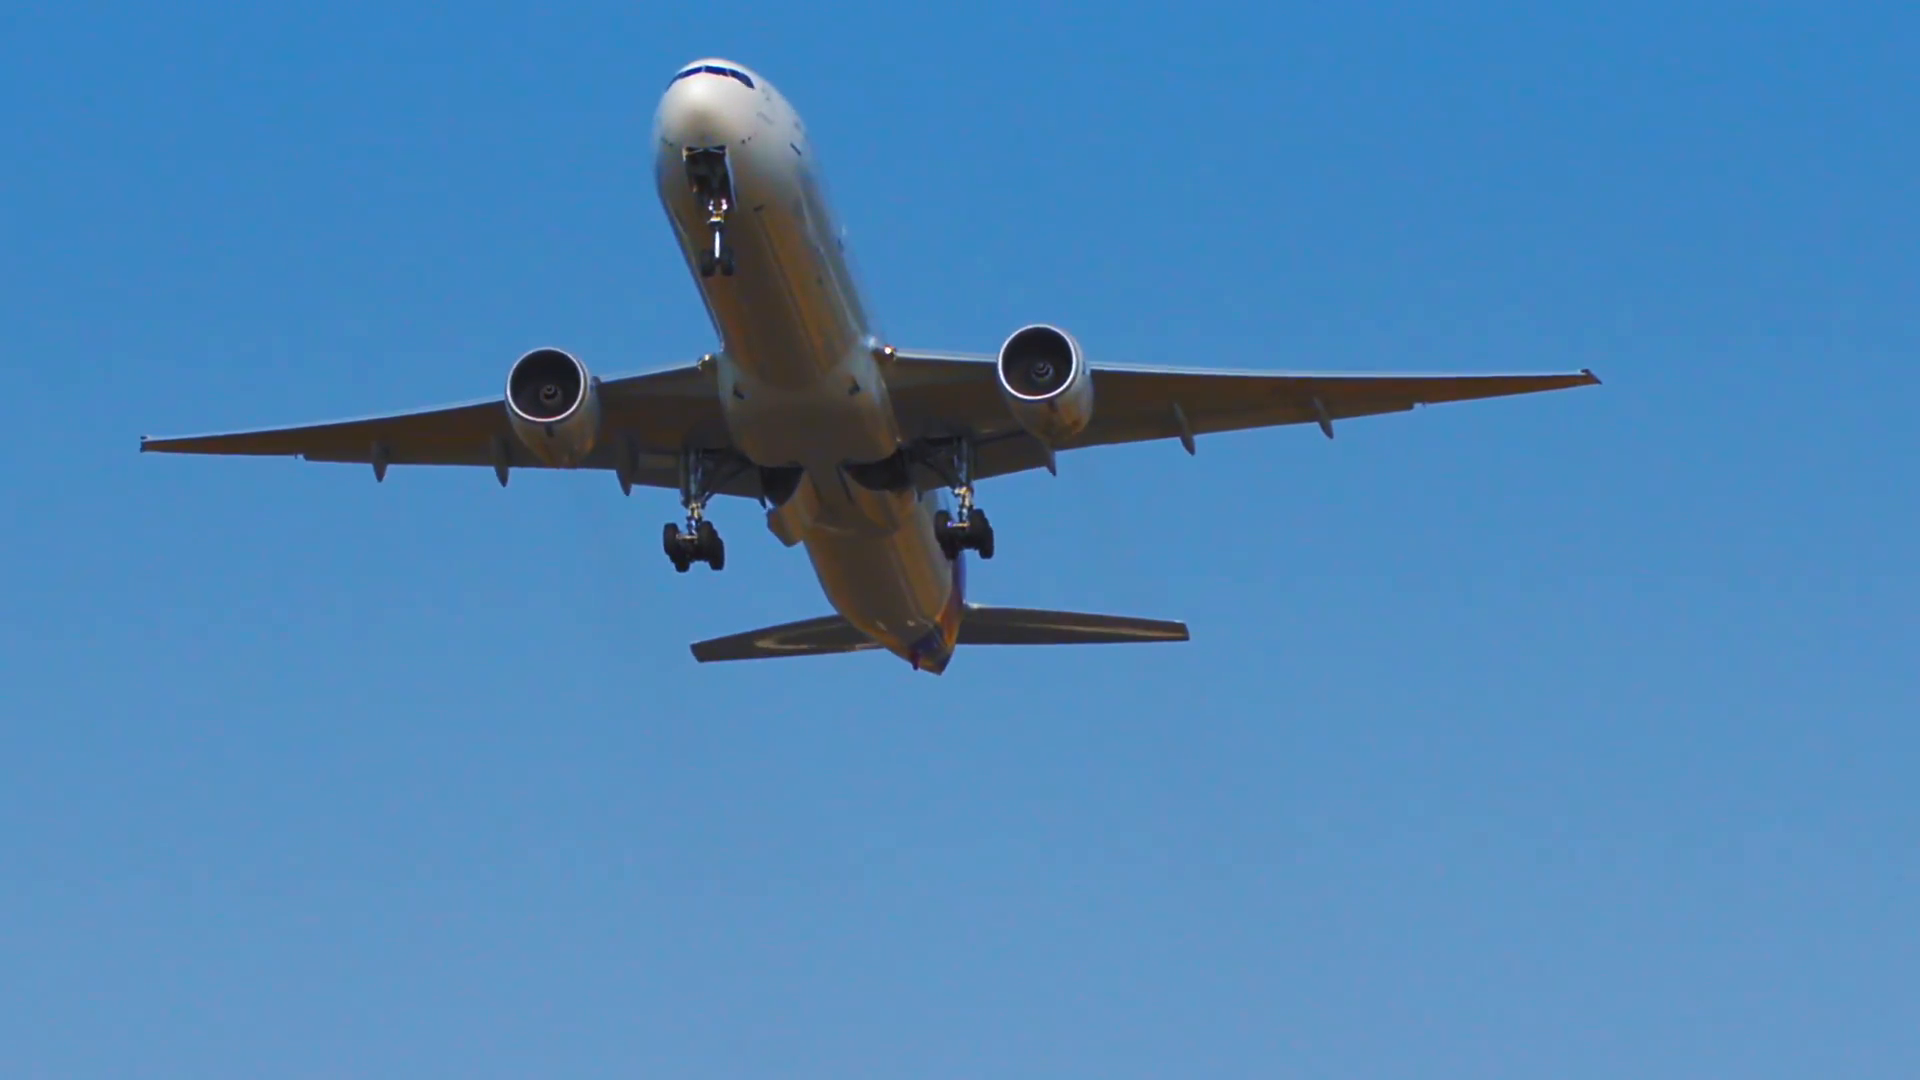 Airplane takeoff from runway landing strip of airport. Passenger jet ...